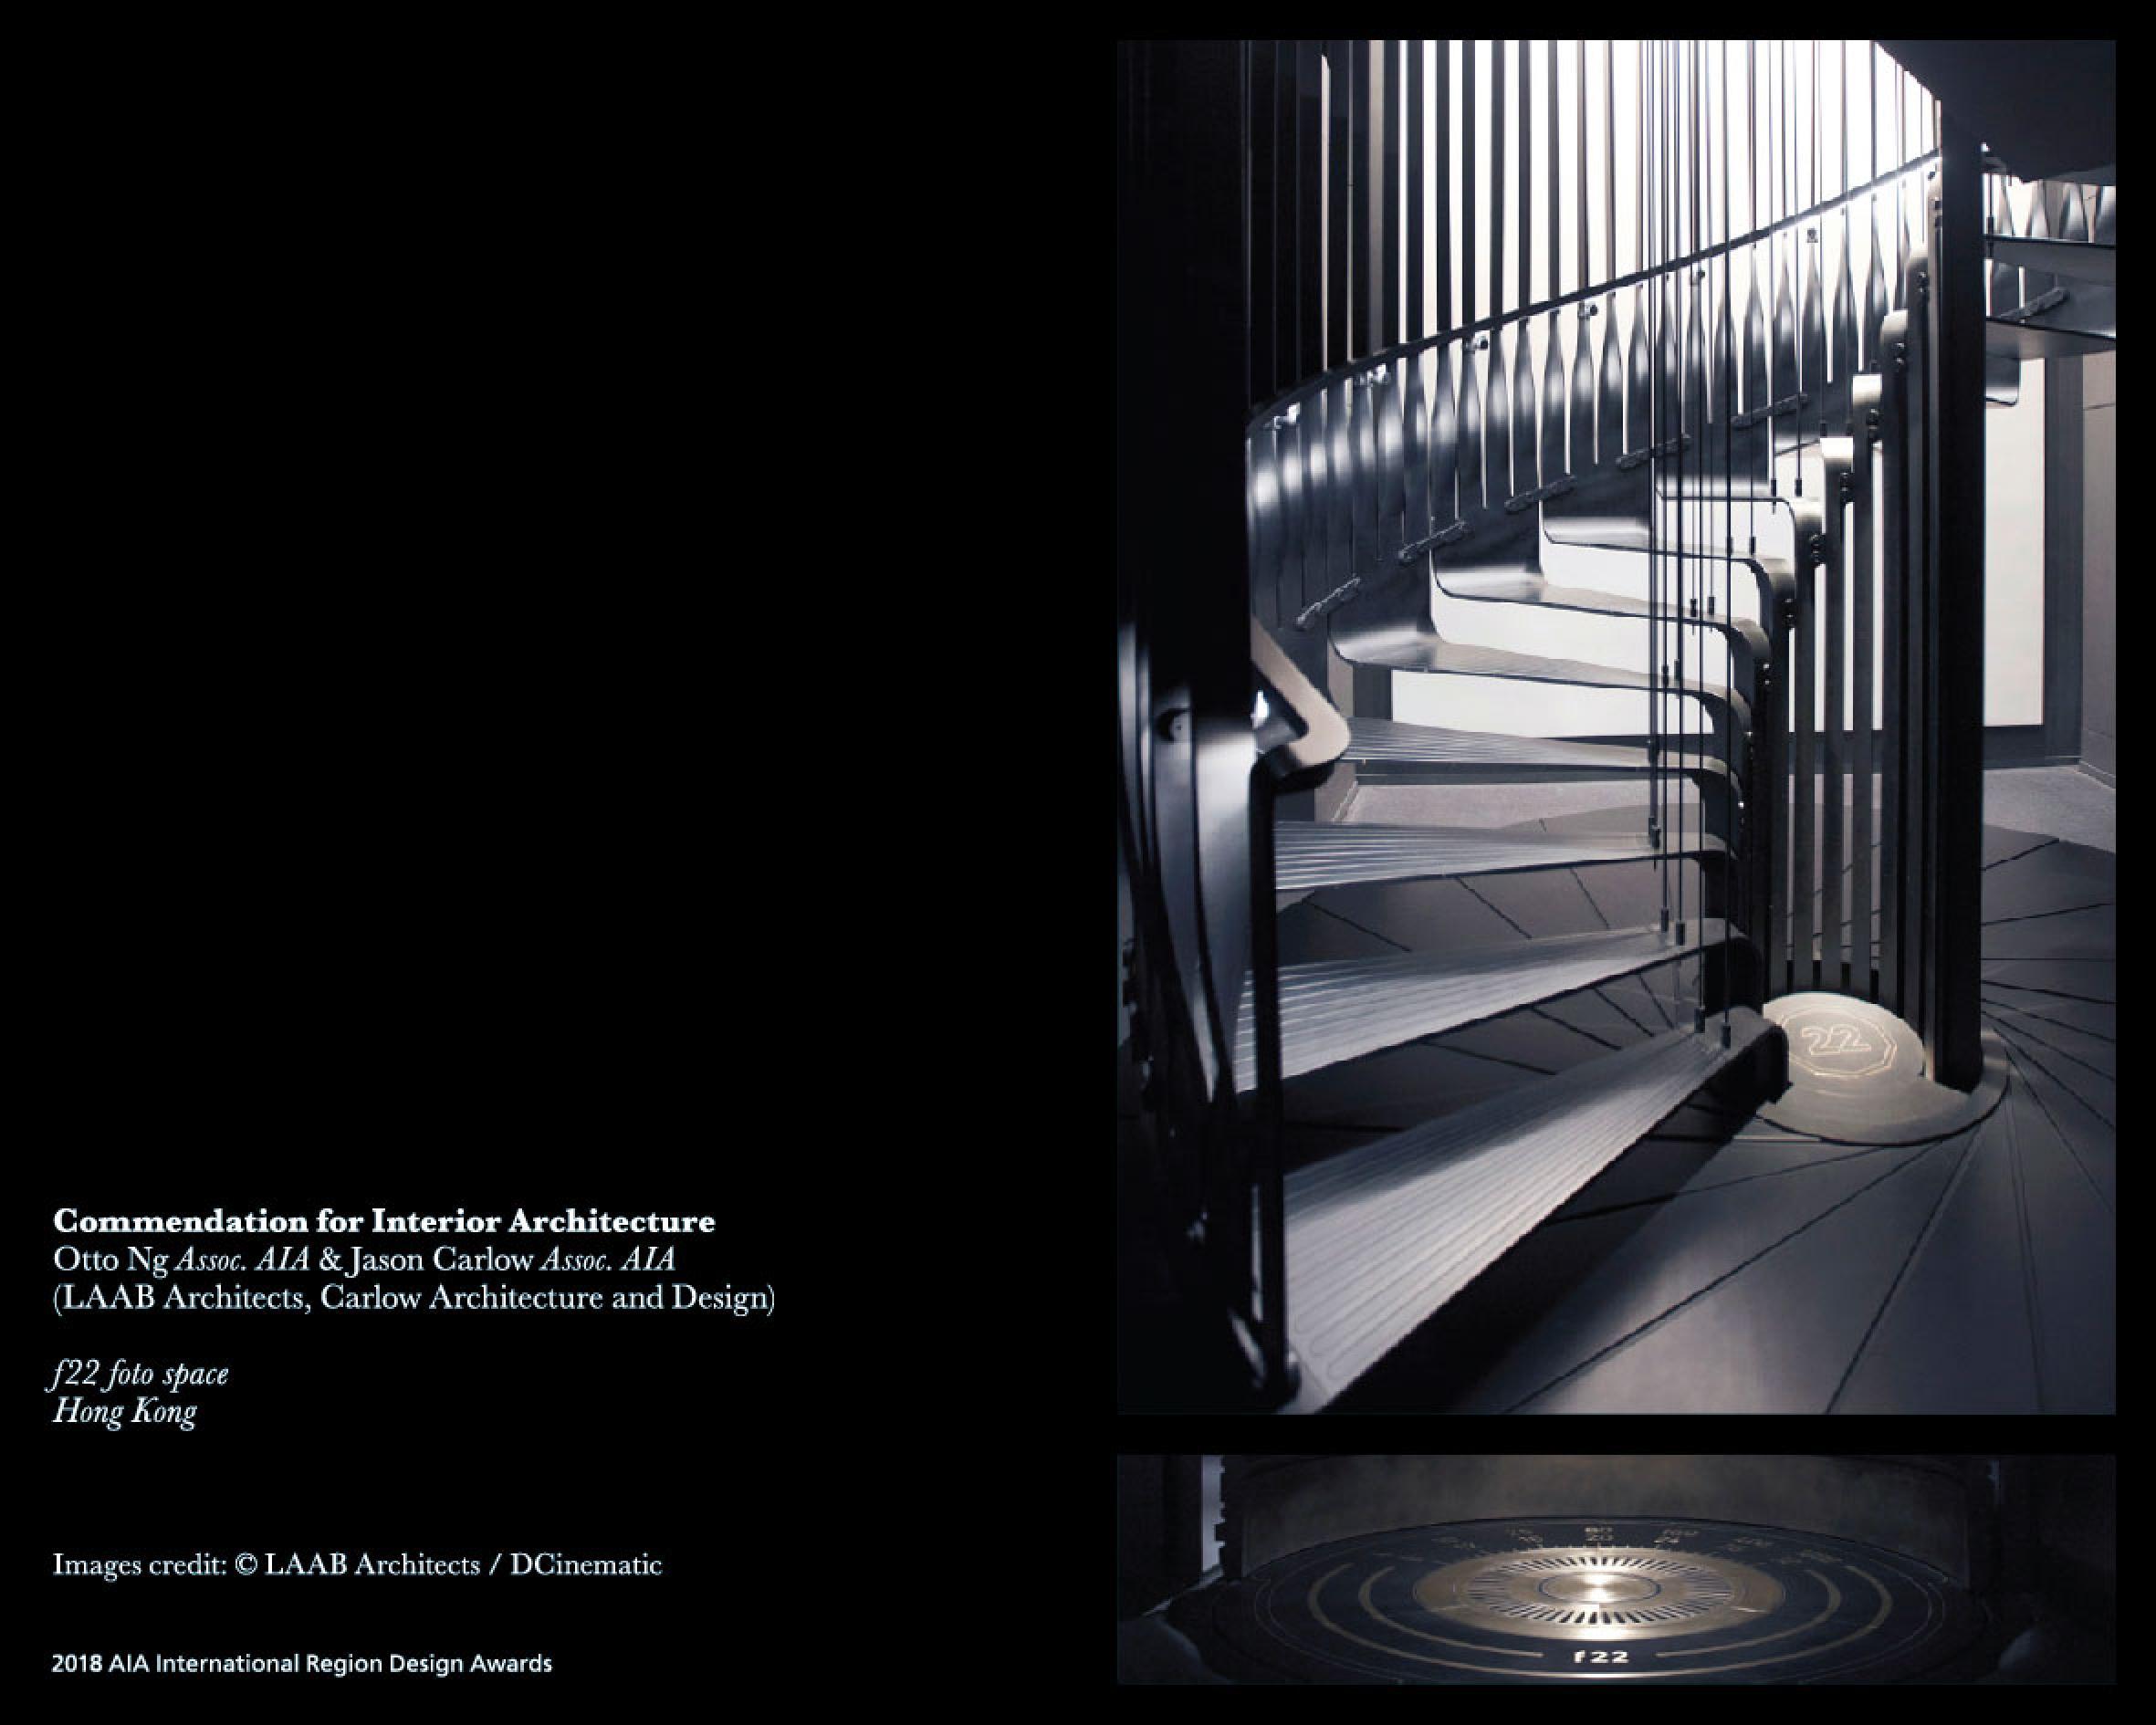 aiair design awards 2018 (14).jpg